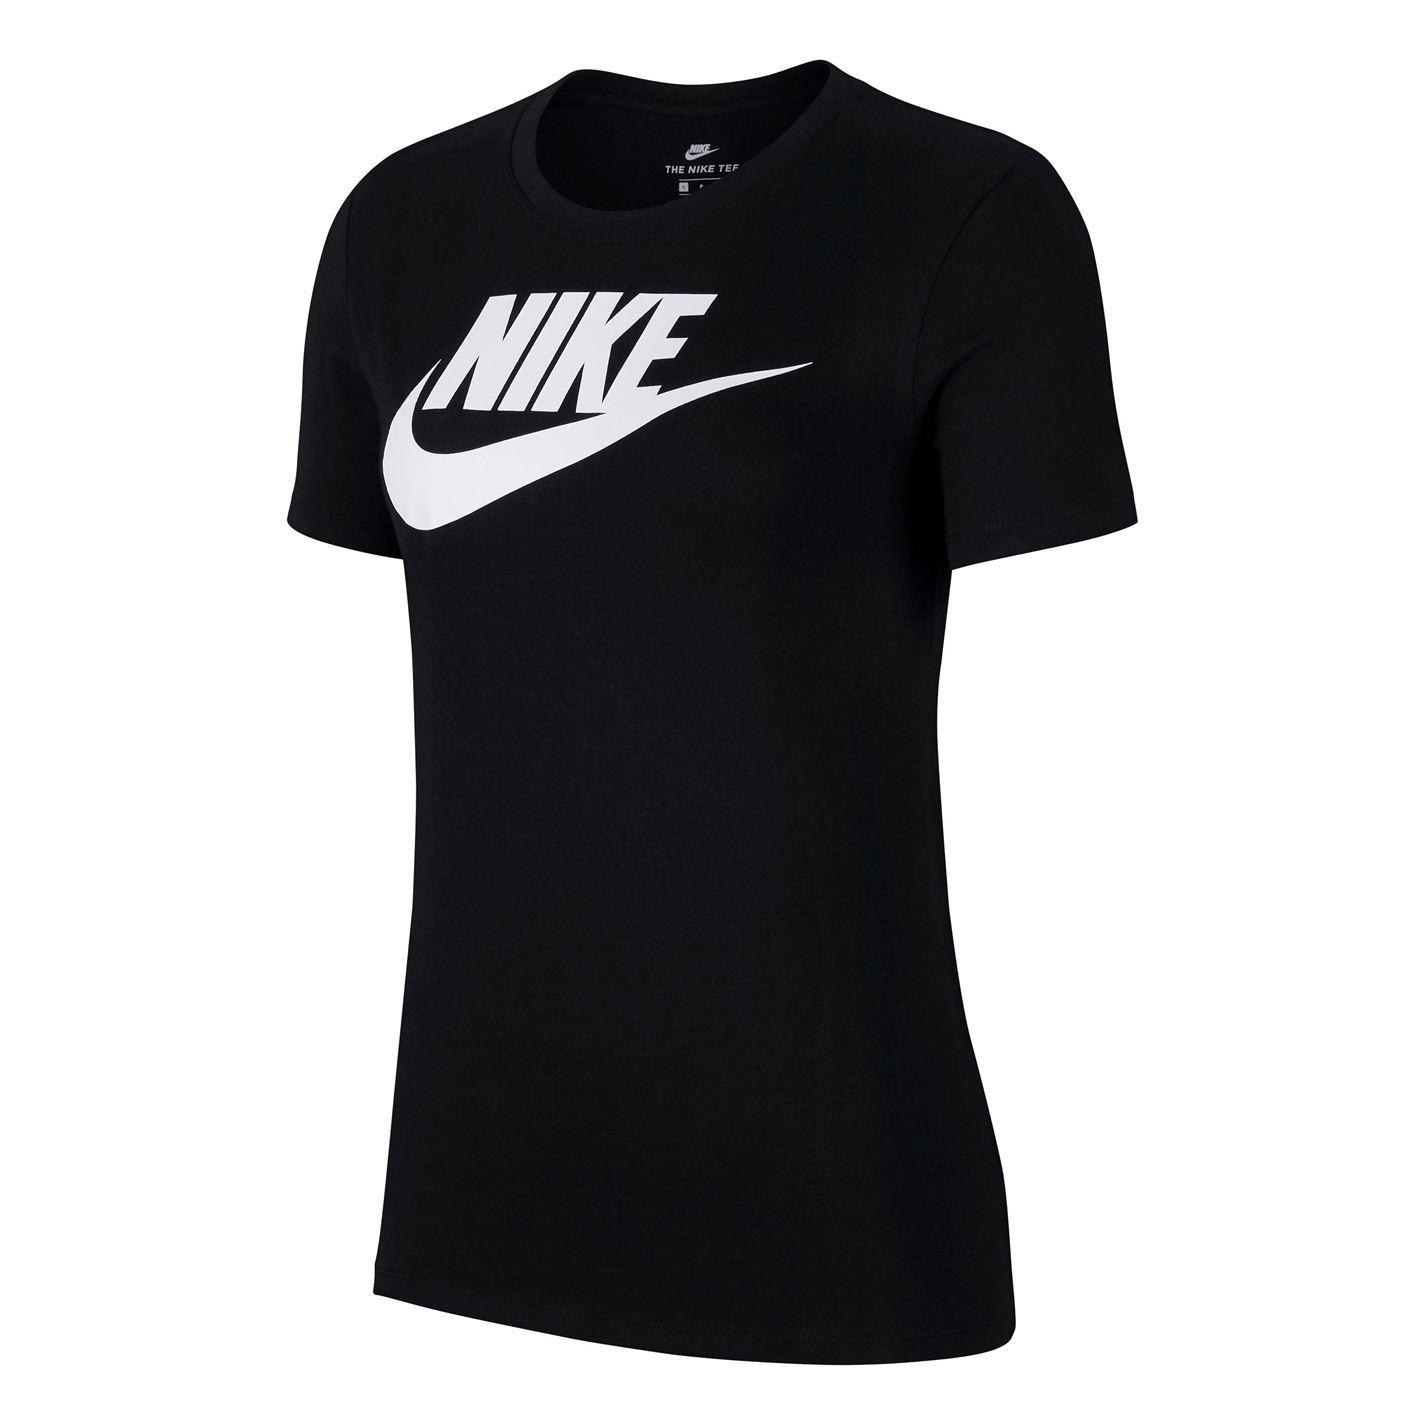 Nike Futura T-Shirt Womens Top Tee Shirt Athleisure Activewear